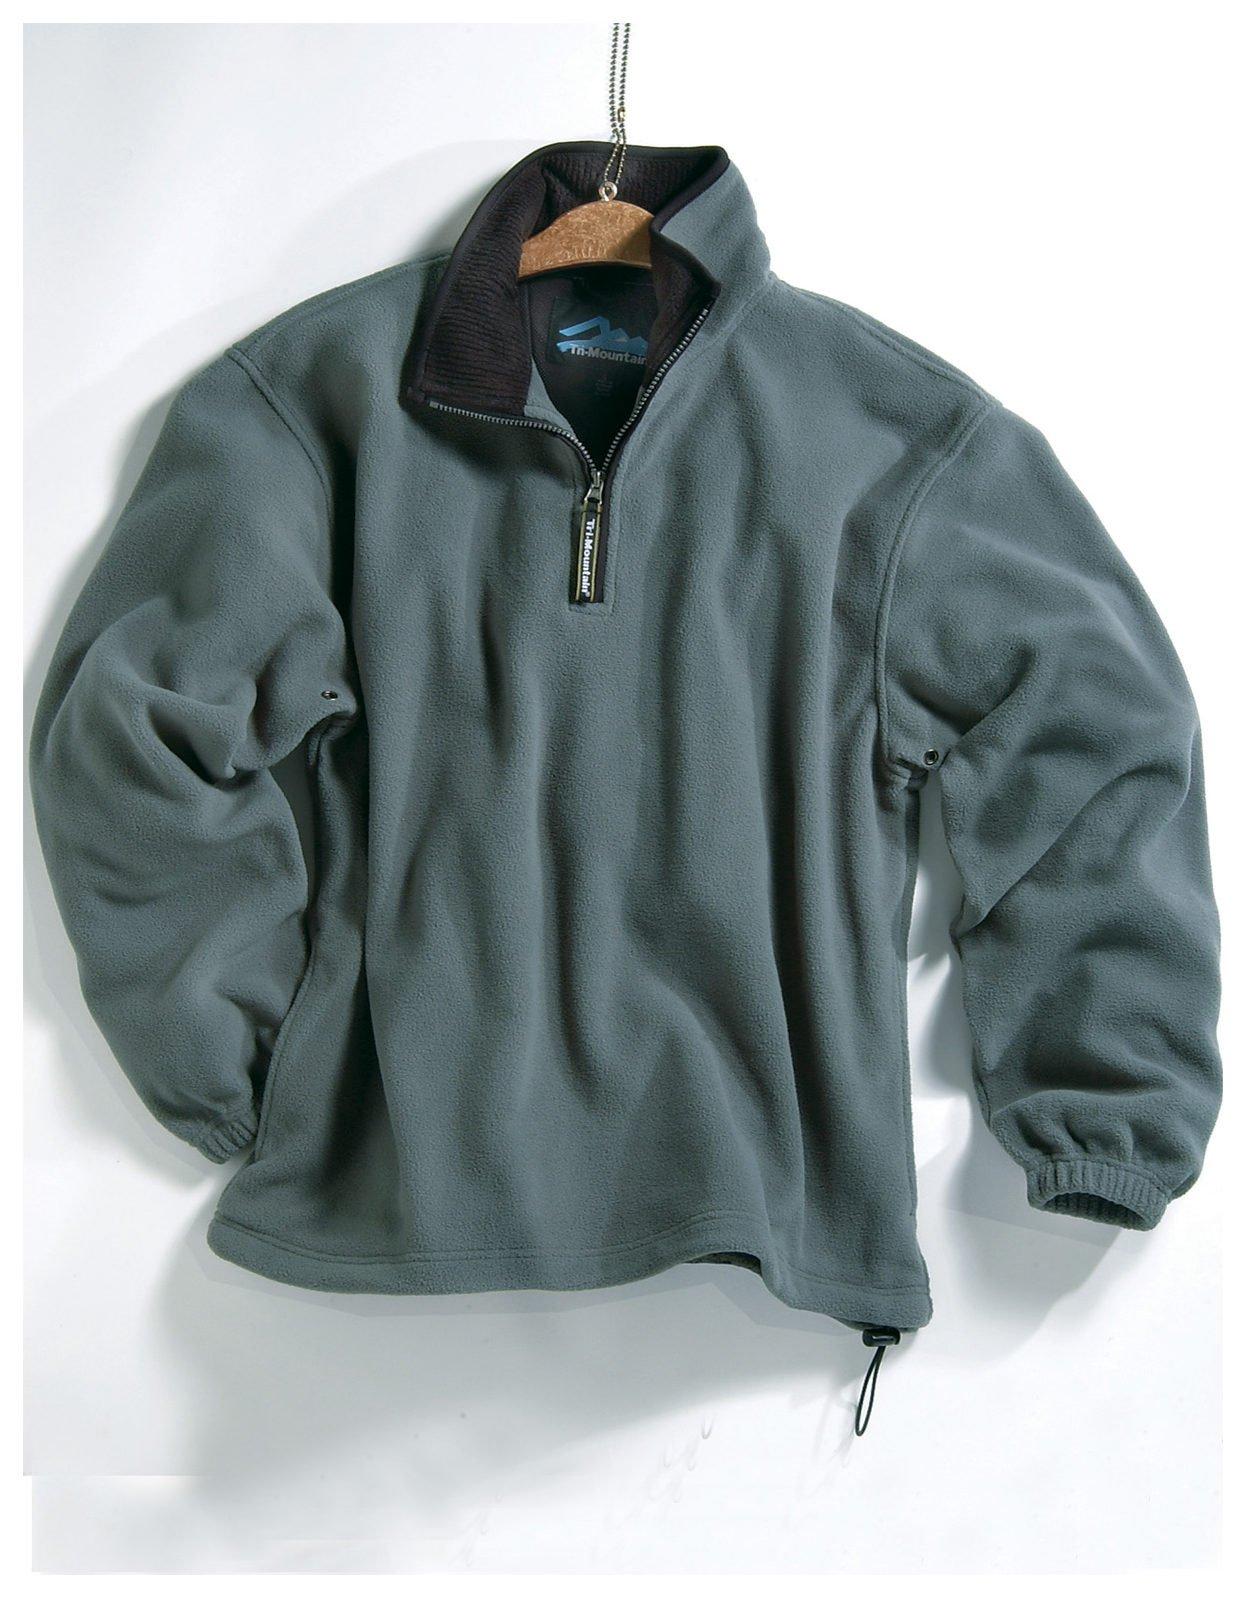 Tri-mountain Micro fleece 1/4 zip pullover. 7100TM - SAGE / BLACK_L